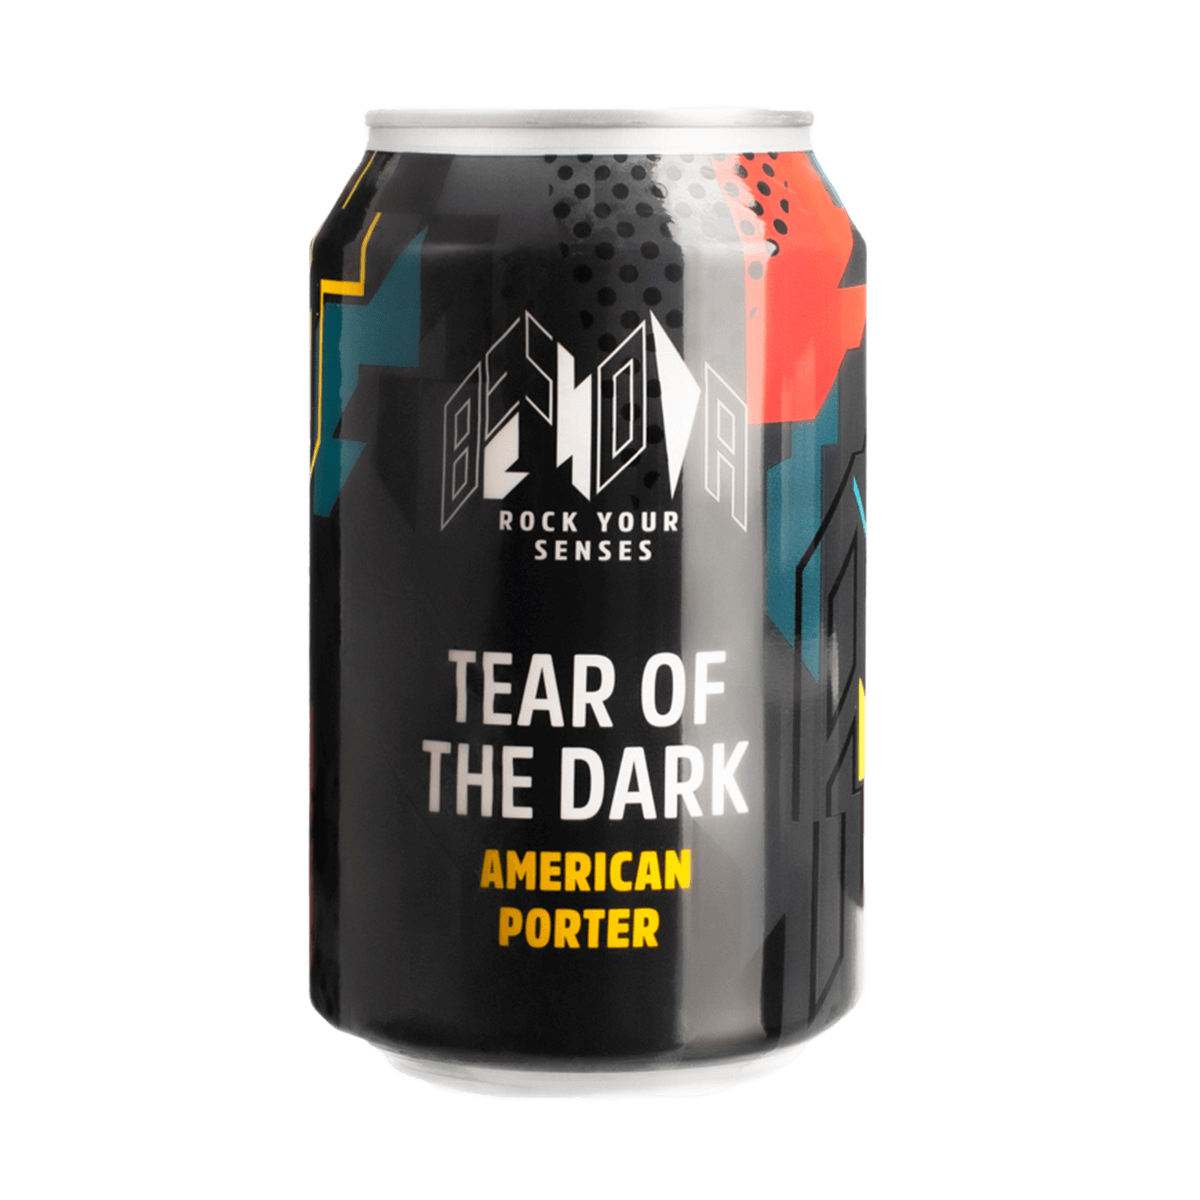 https://bersnova.ro/wp-content/uploads/2020/10/Doza-mare-Tear-of-the-Dark.png